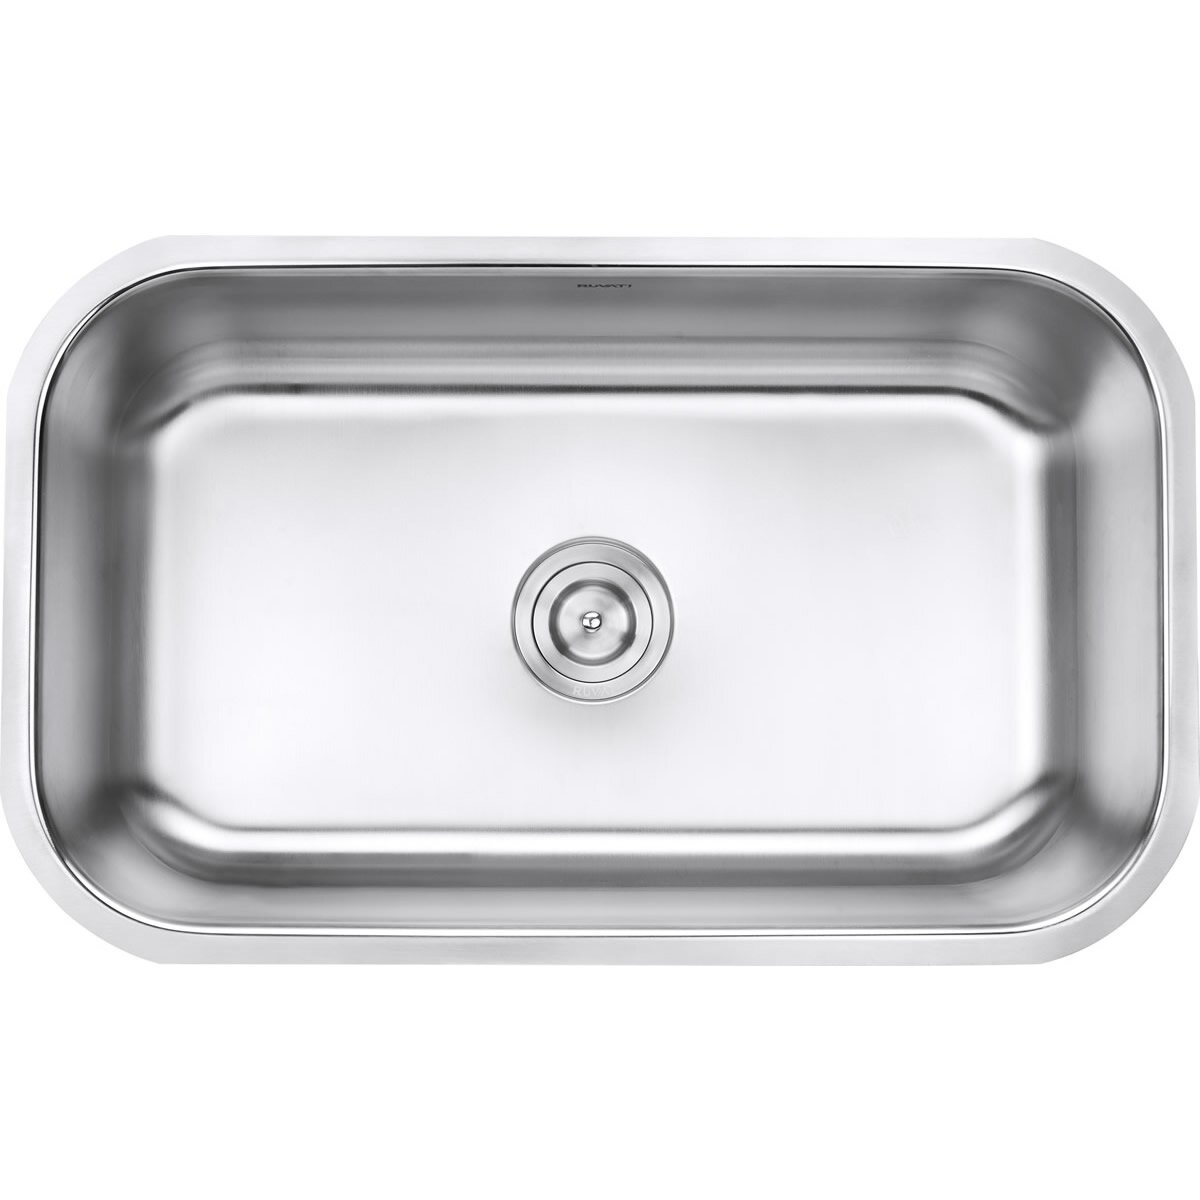 Ruvati Parmi 30 X Undermount 16 Gauge Single Bowl Kitchen Sink Reviews Wayfair